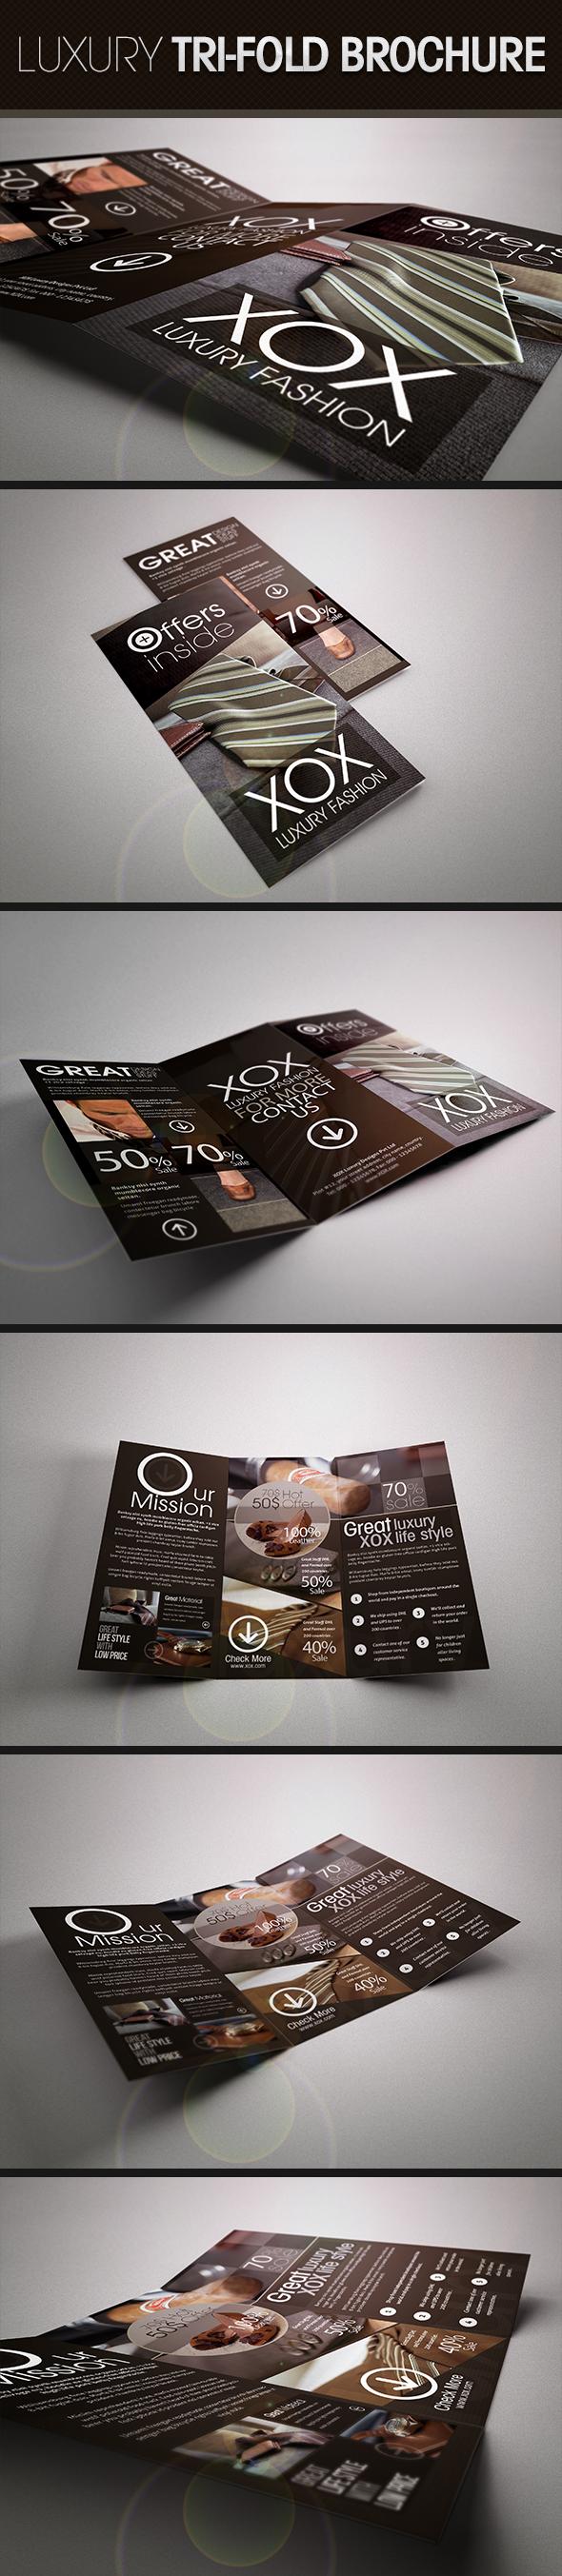 Luxury Trifold Brochure by UnicoDesign